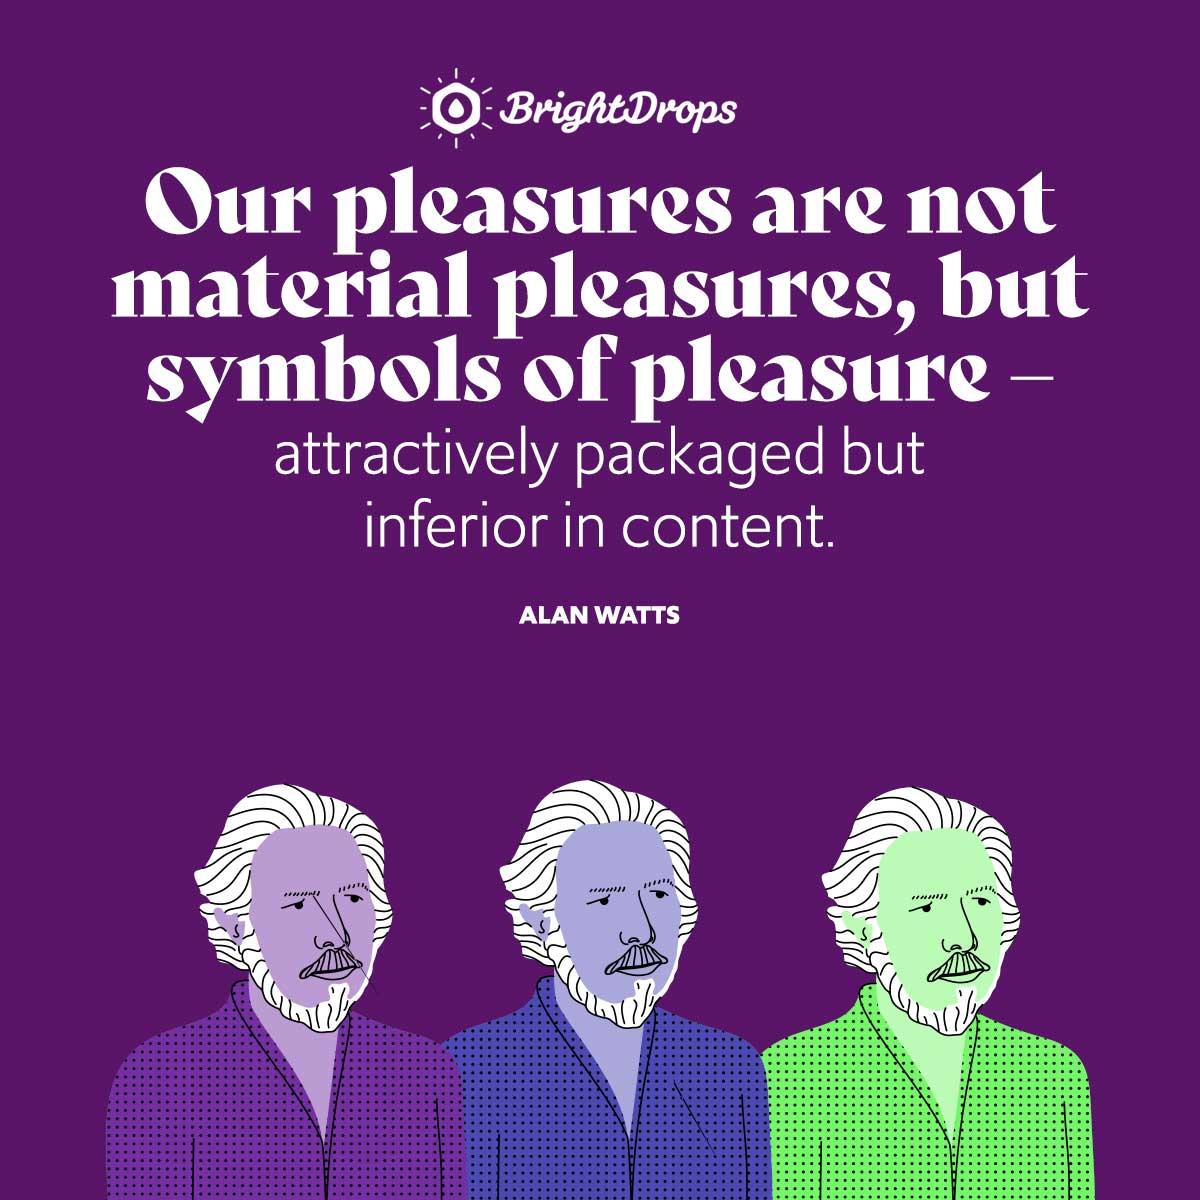 Alan Watts Quotes On Pleasure